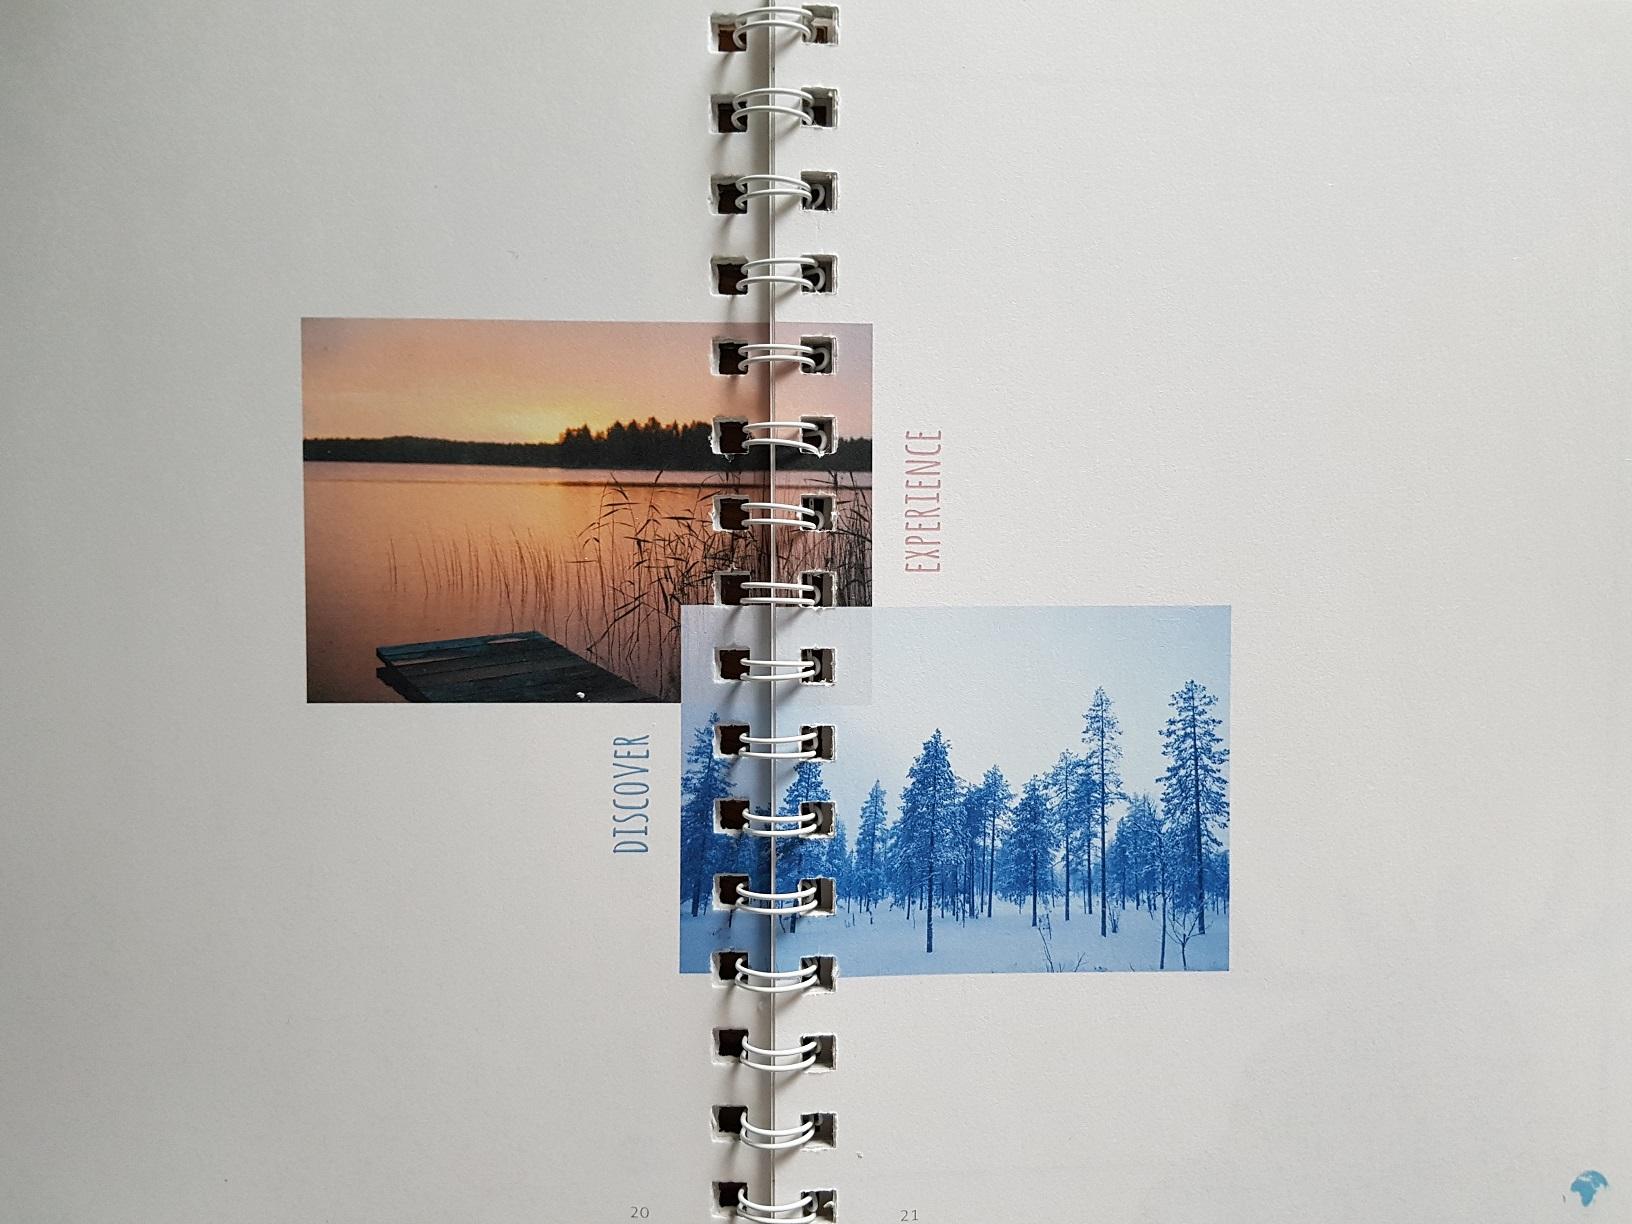 Inhalt des JourneyBook Skandinavien